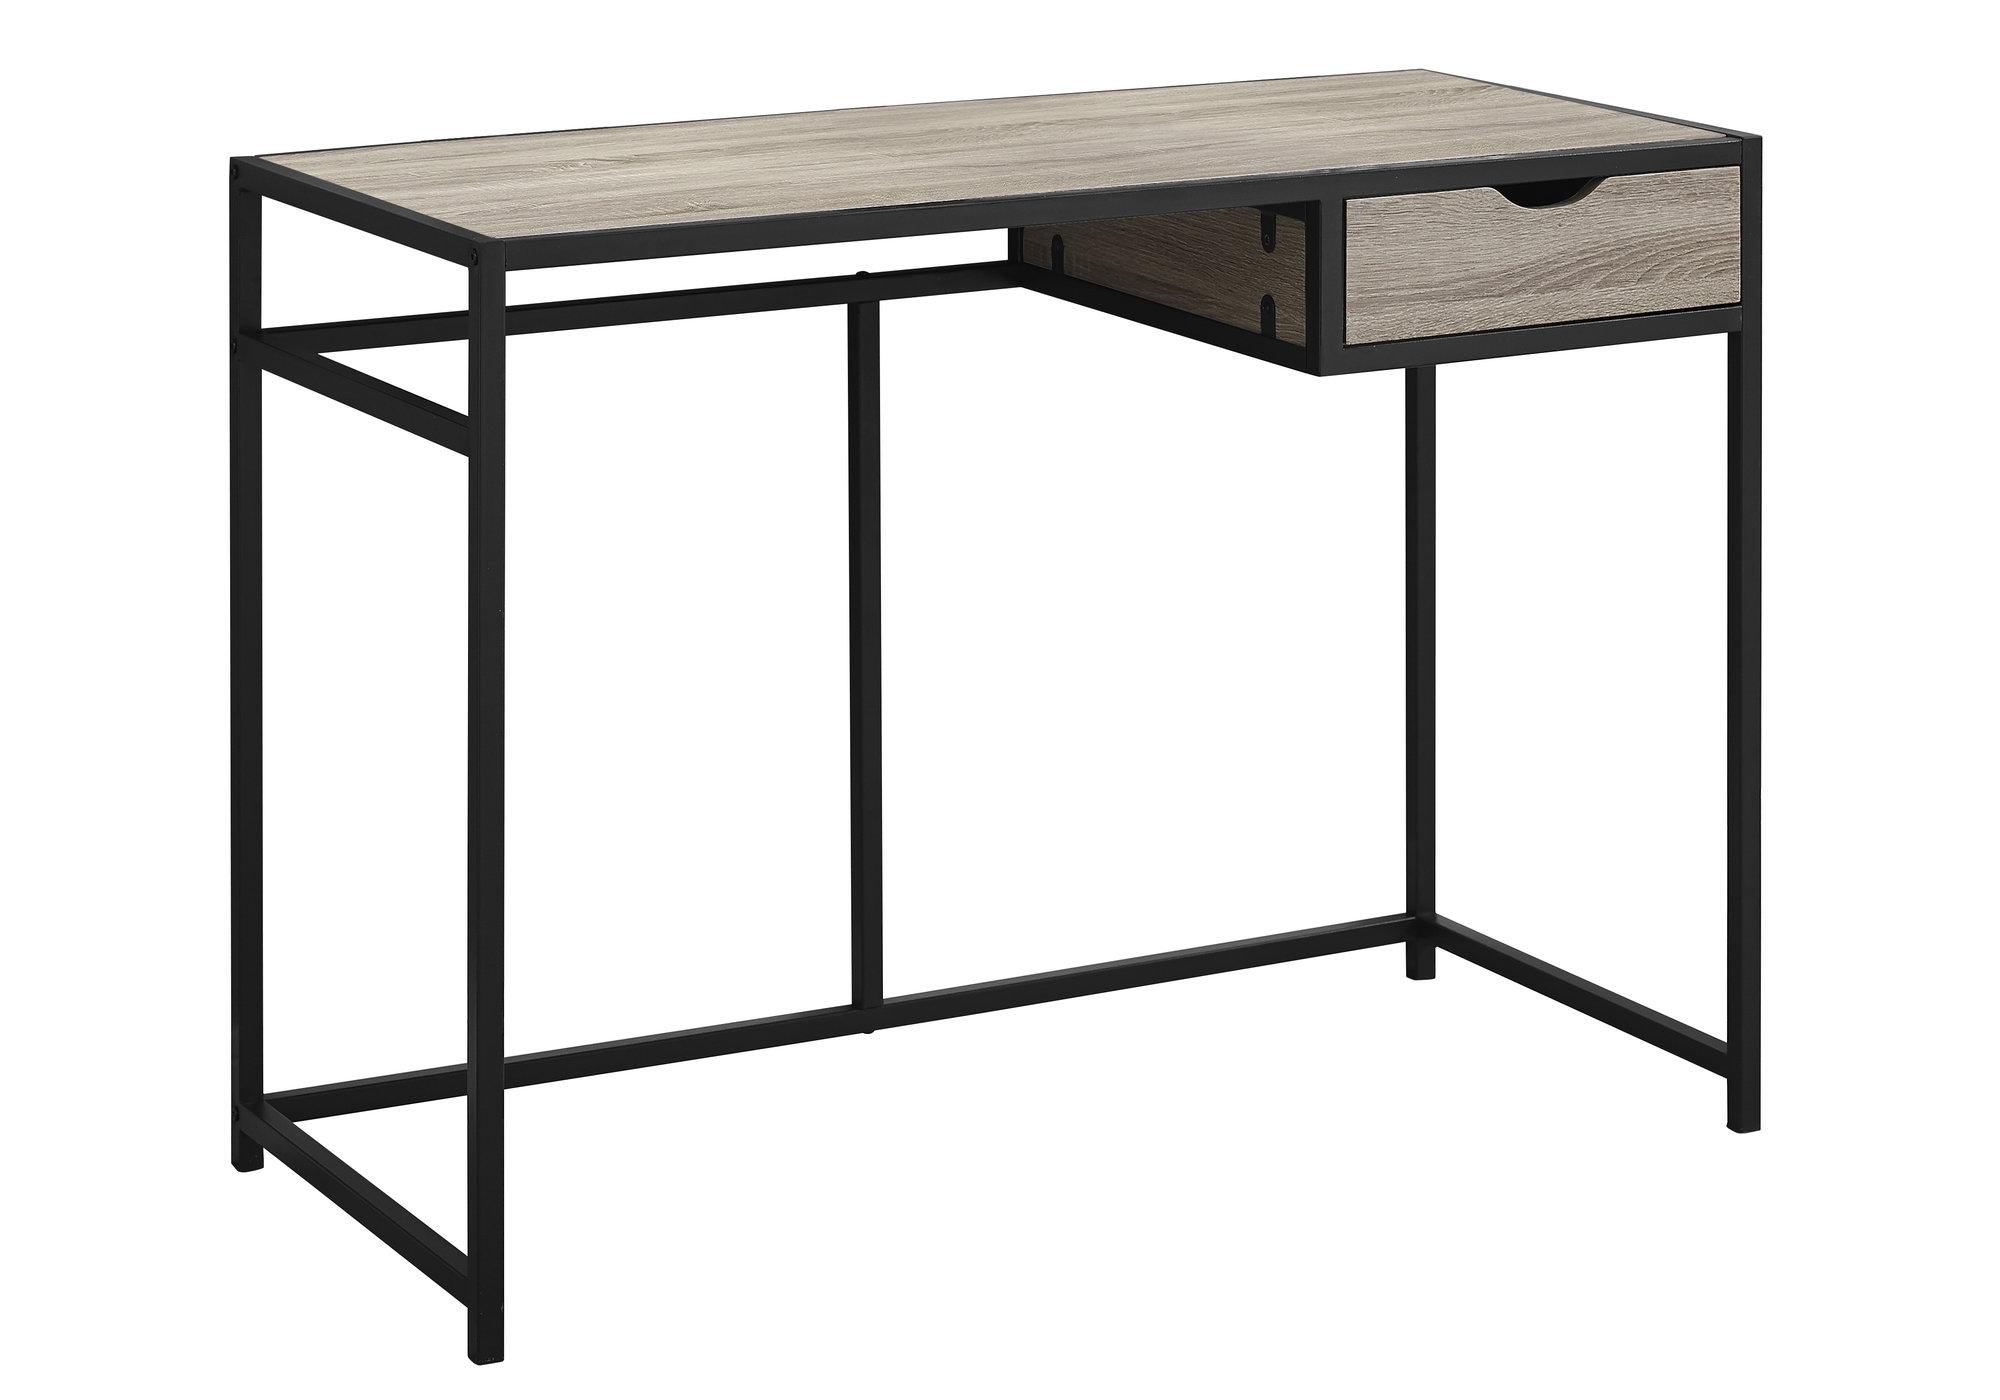 "20"" x 42.25"" x 30"" Dark Taupe Black Mdf Metal  Computer Desk"